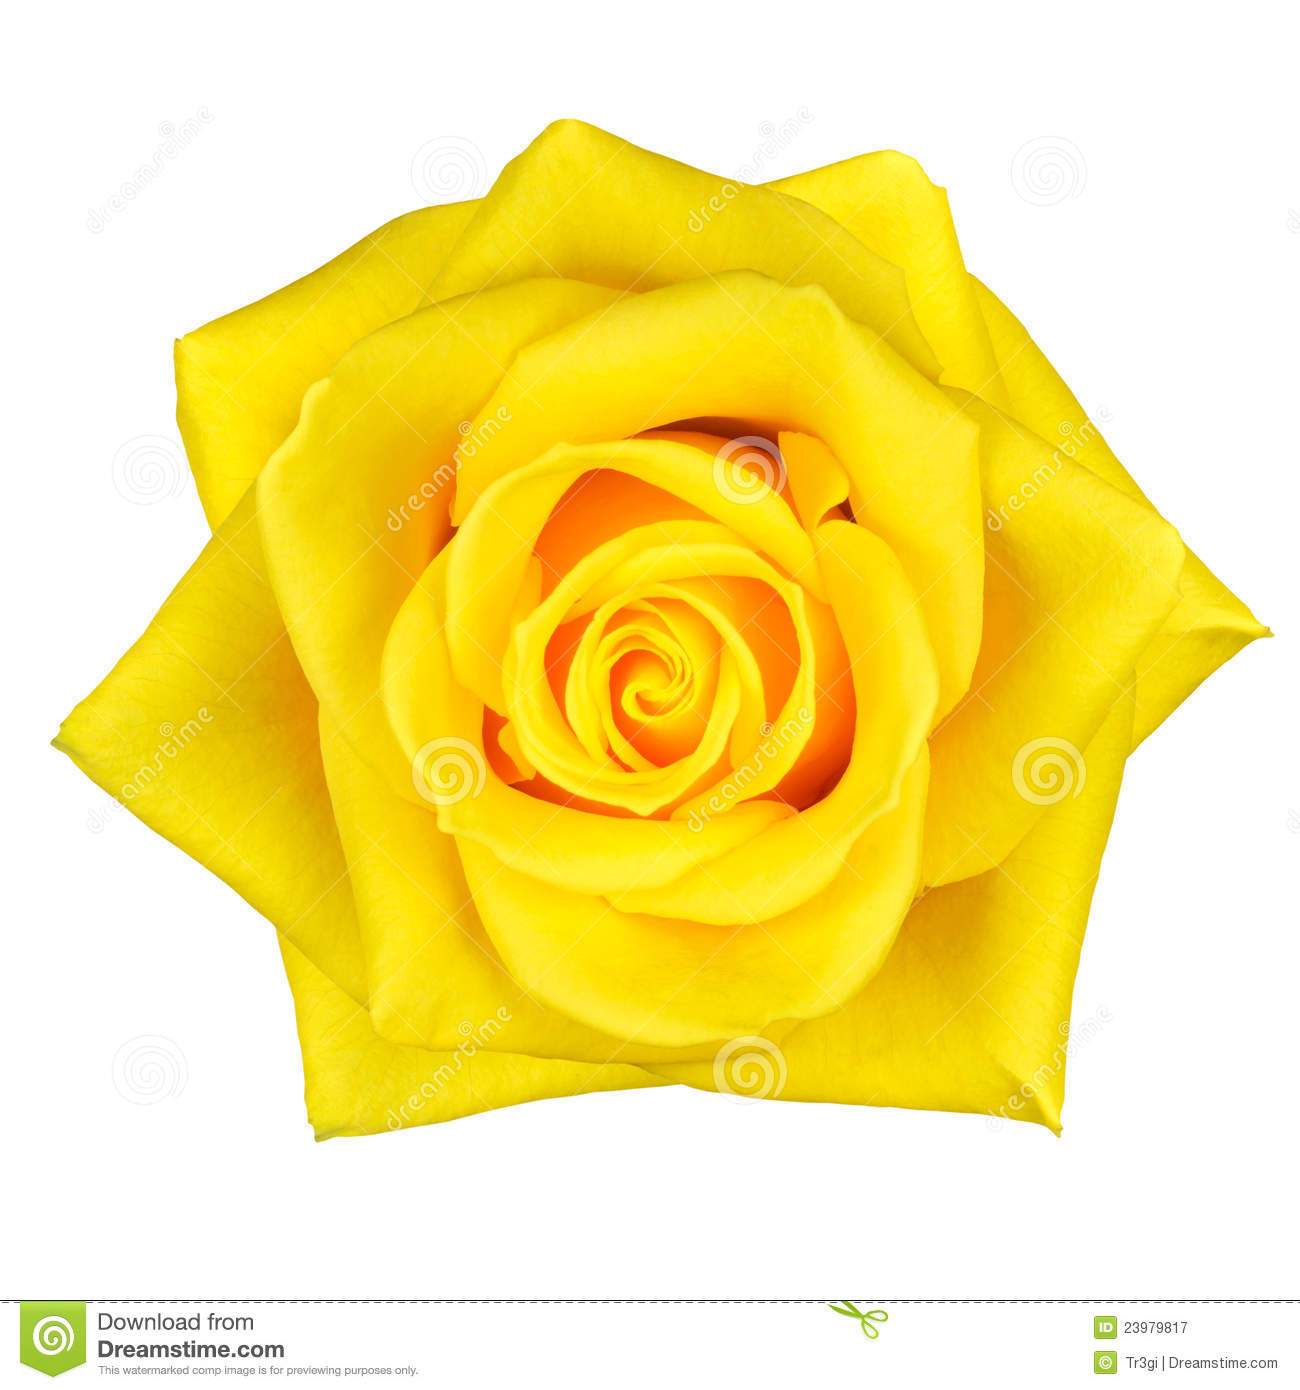 Yellow Rose Images Clip Art Beautiful Ye-Yellow Rose Images Clip Art Beautiful Yellow Rose Flower-6